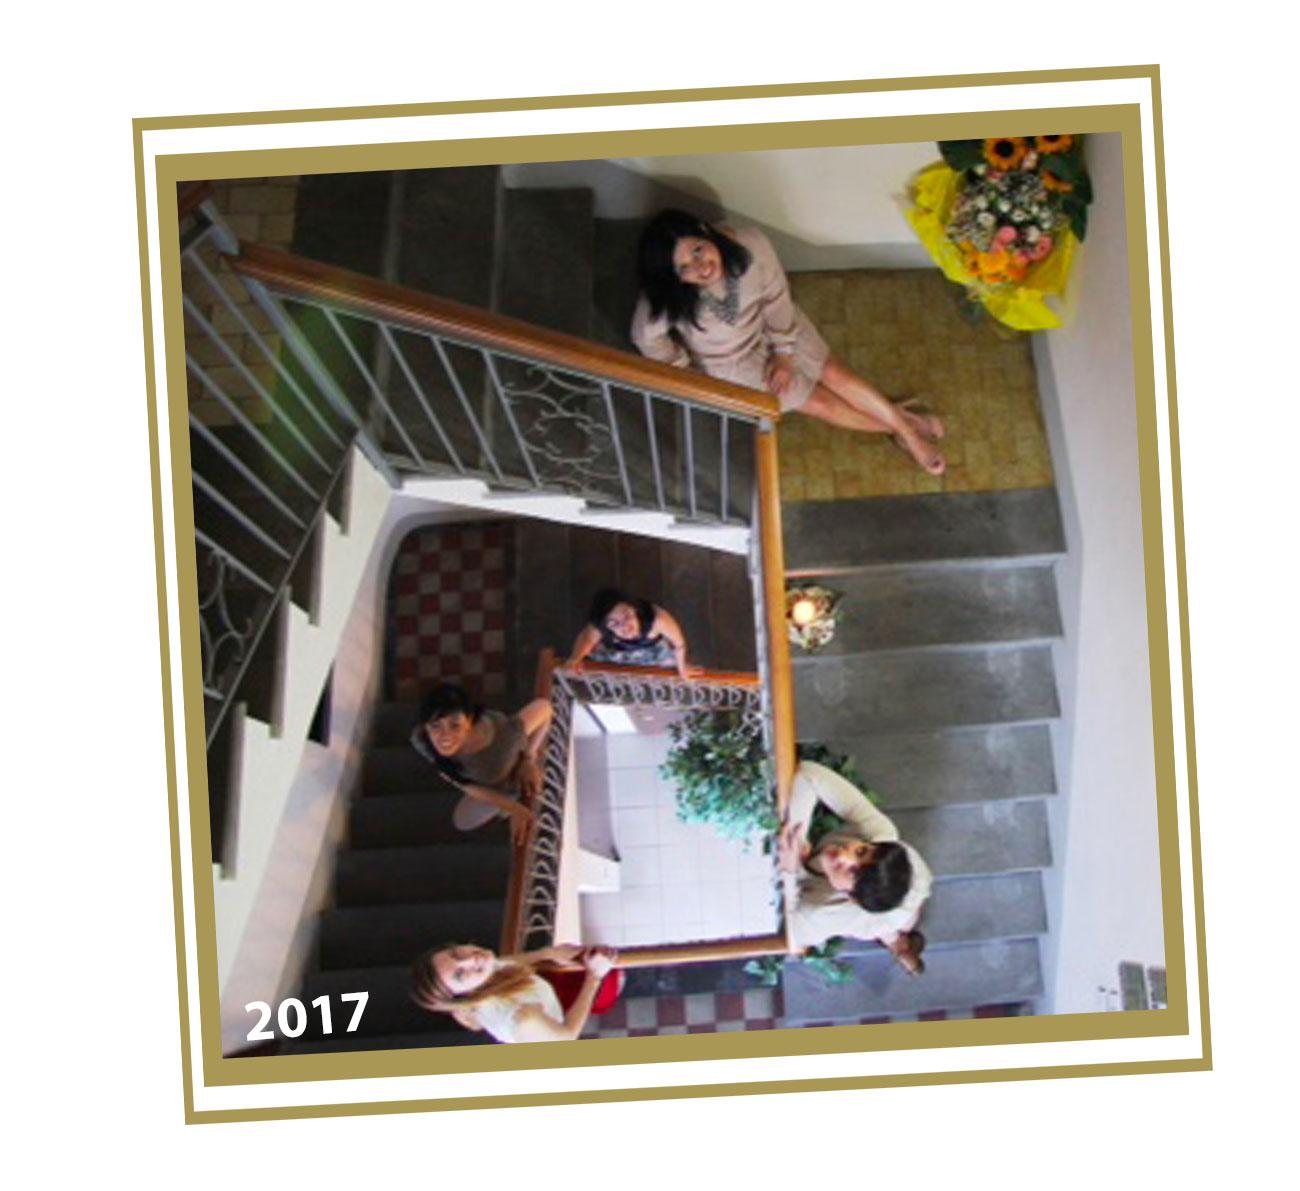 Centro-jolie-2017